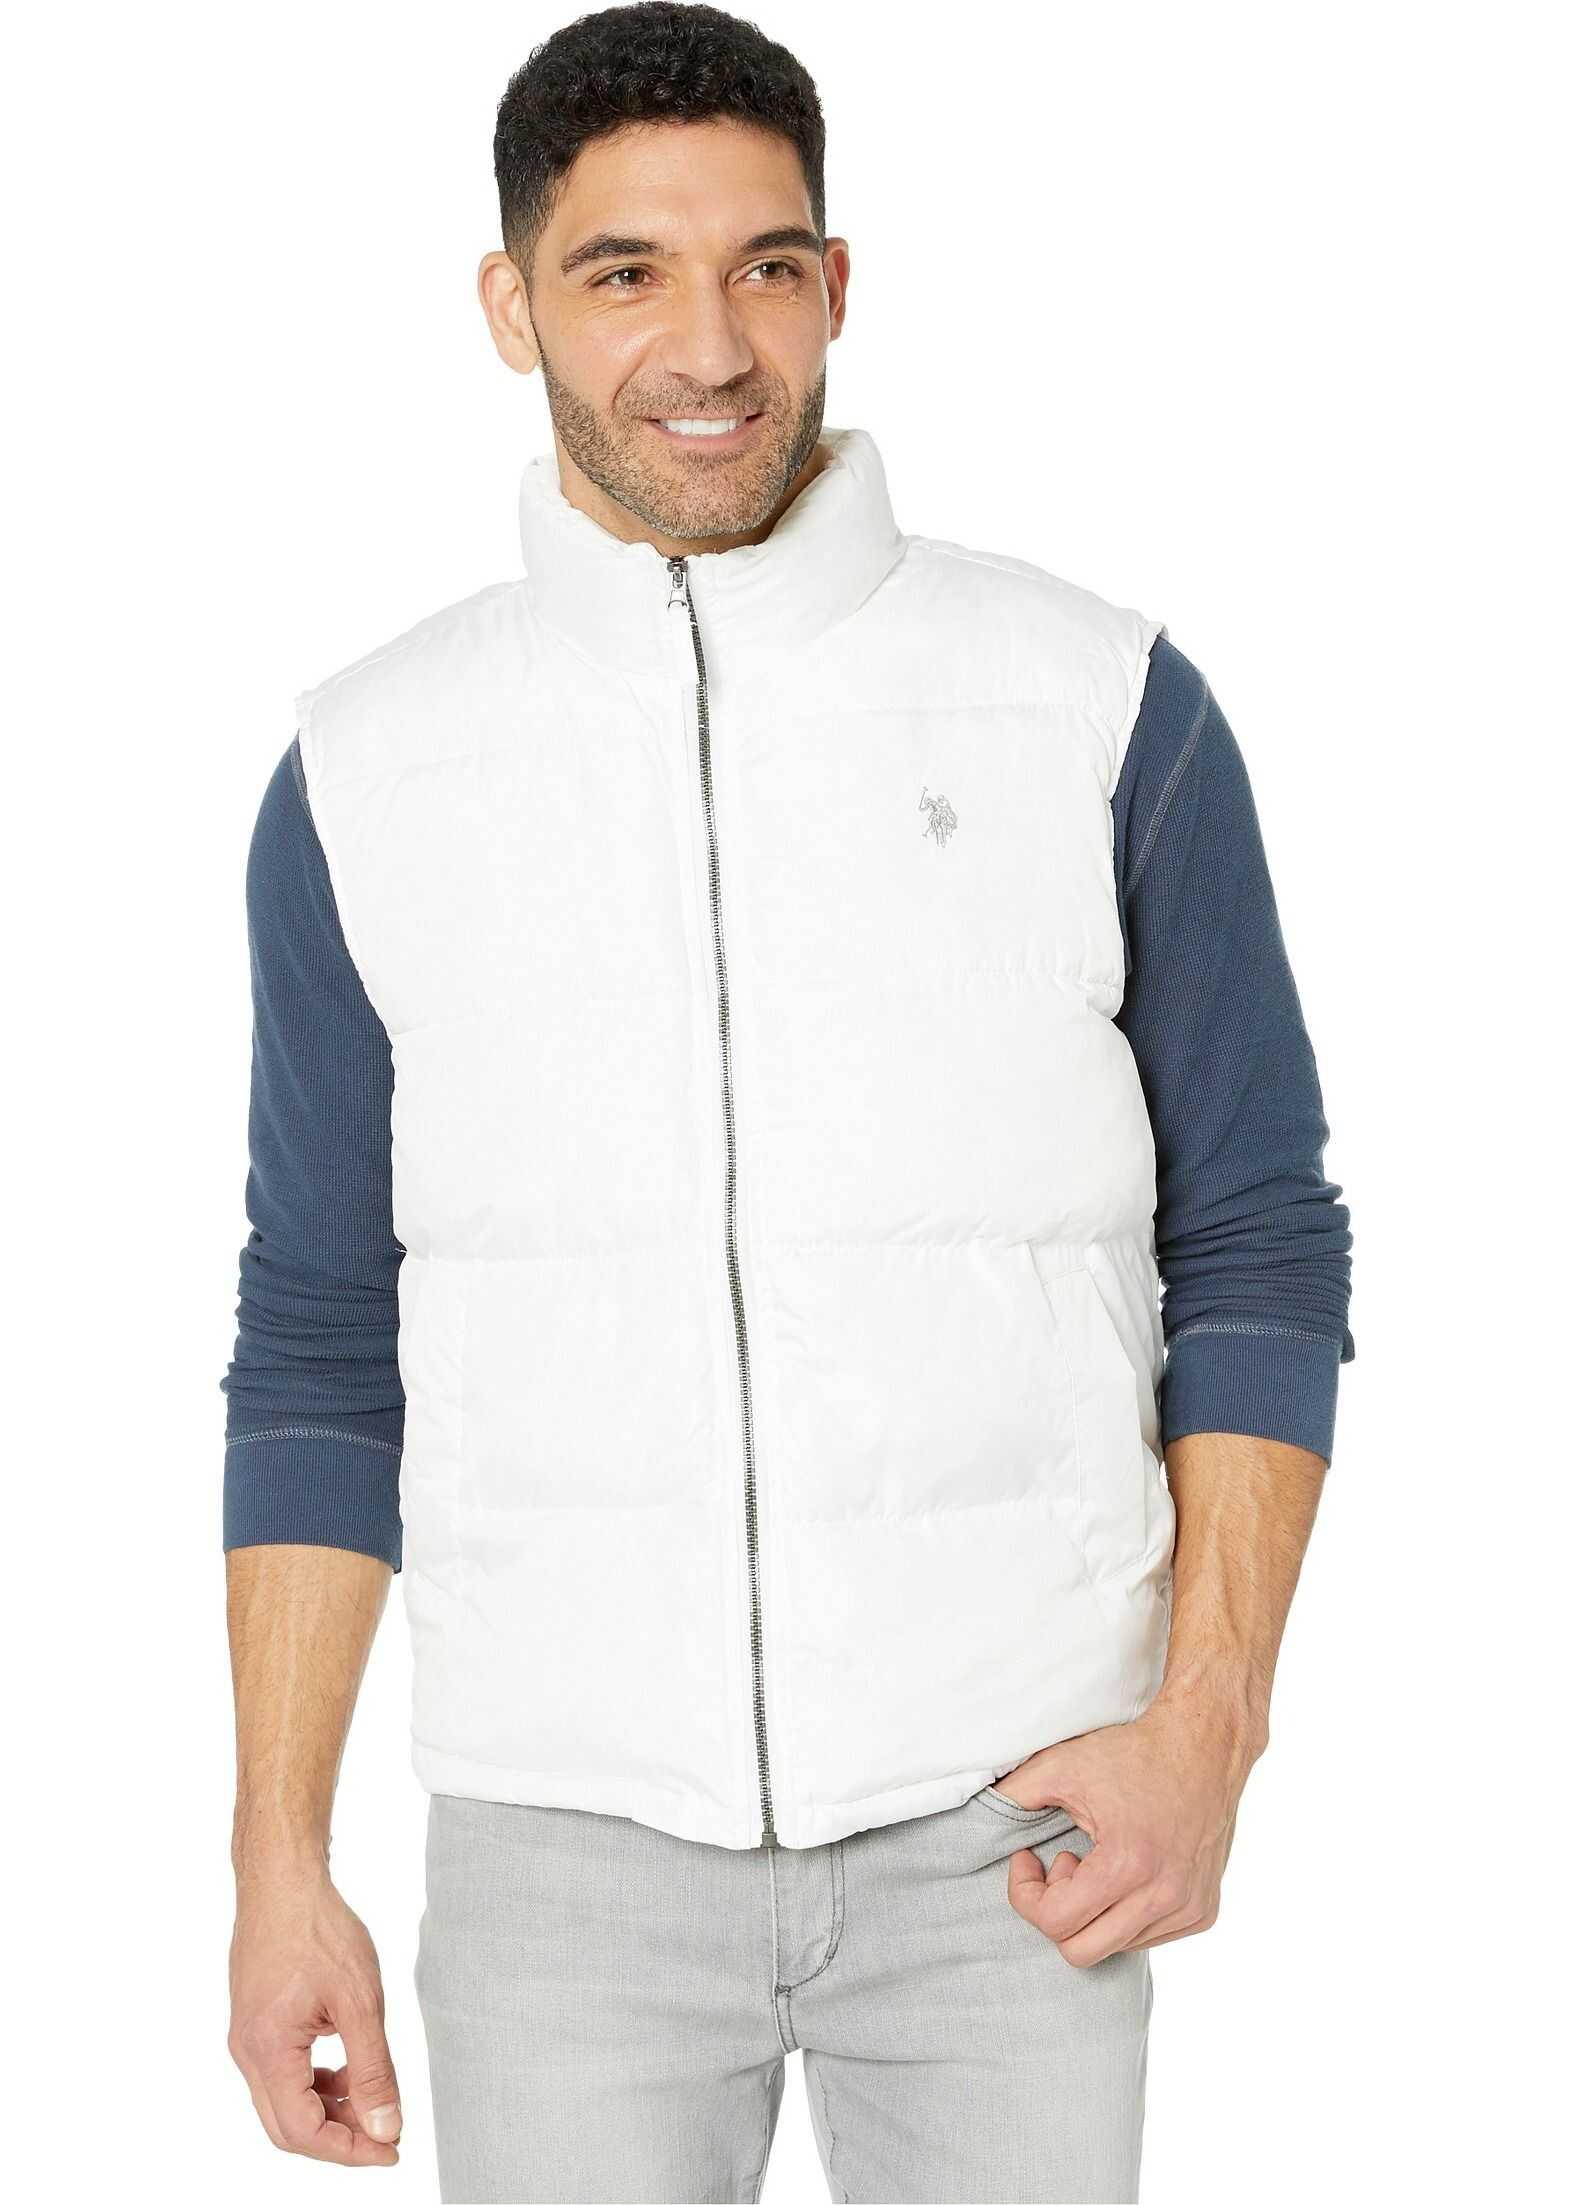 U.S. POLO ASSN. Signature Vest White